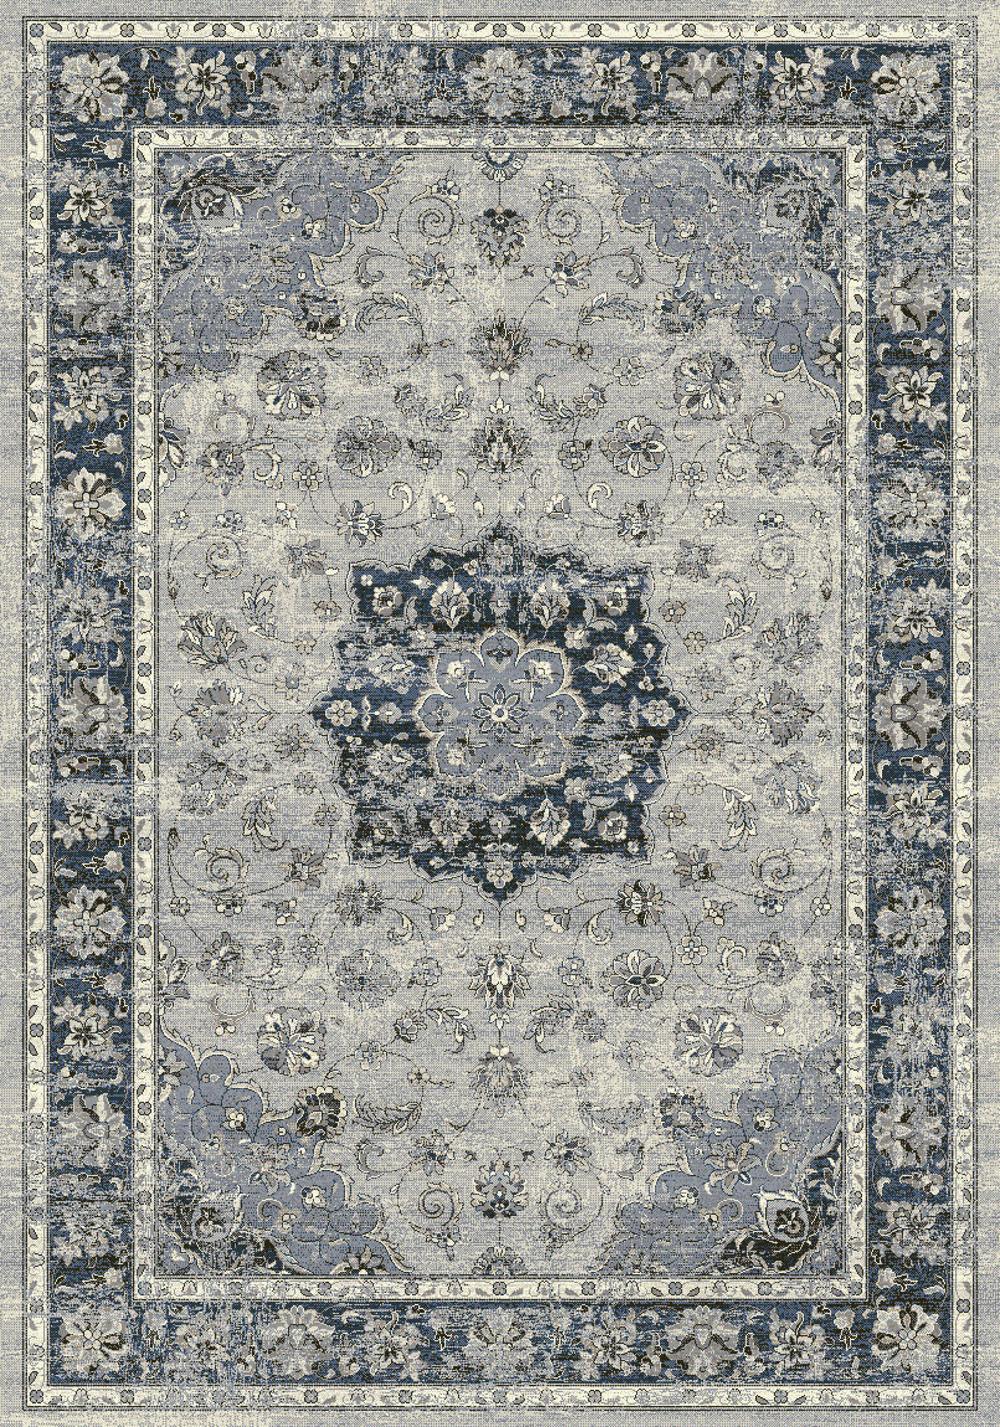 Dynamic ANCIENT GARDEN 57559 SILVER/BLUE Rug